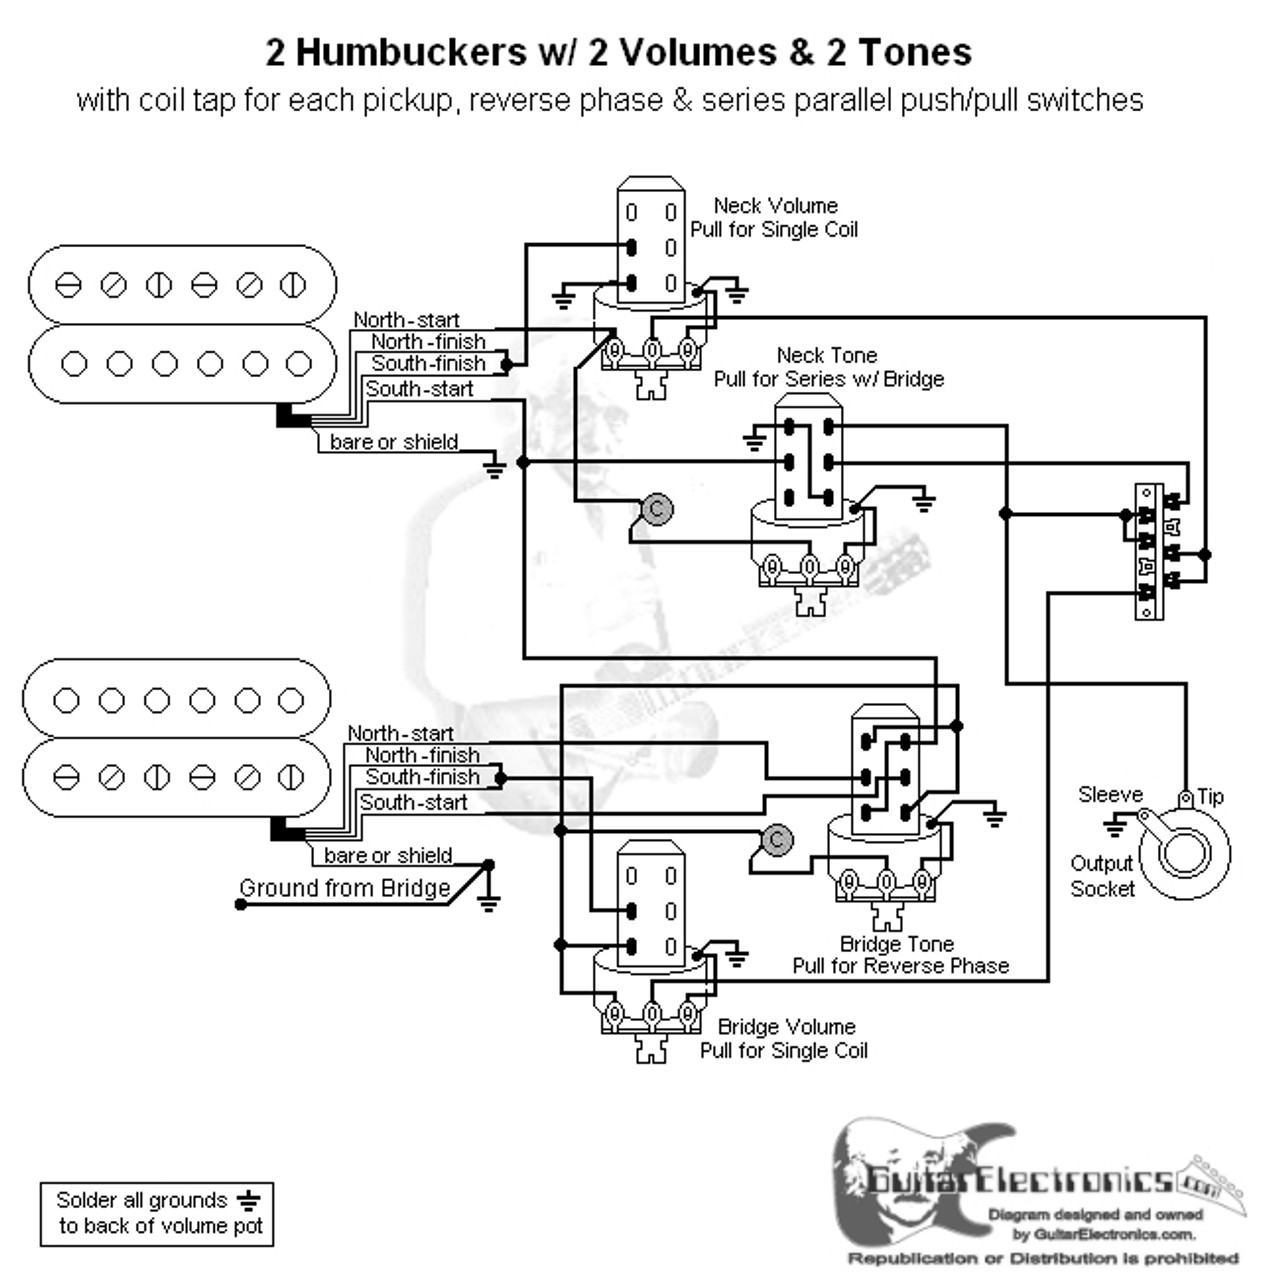 medium resolution of 2 hbs 3 way lever 1 vol 2 tones coil tap u0026 series parallel